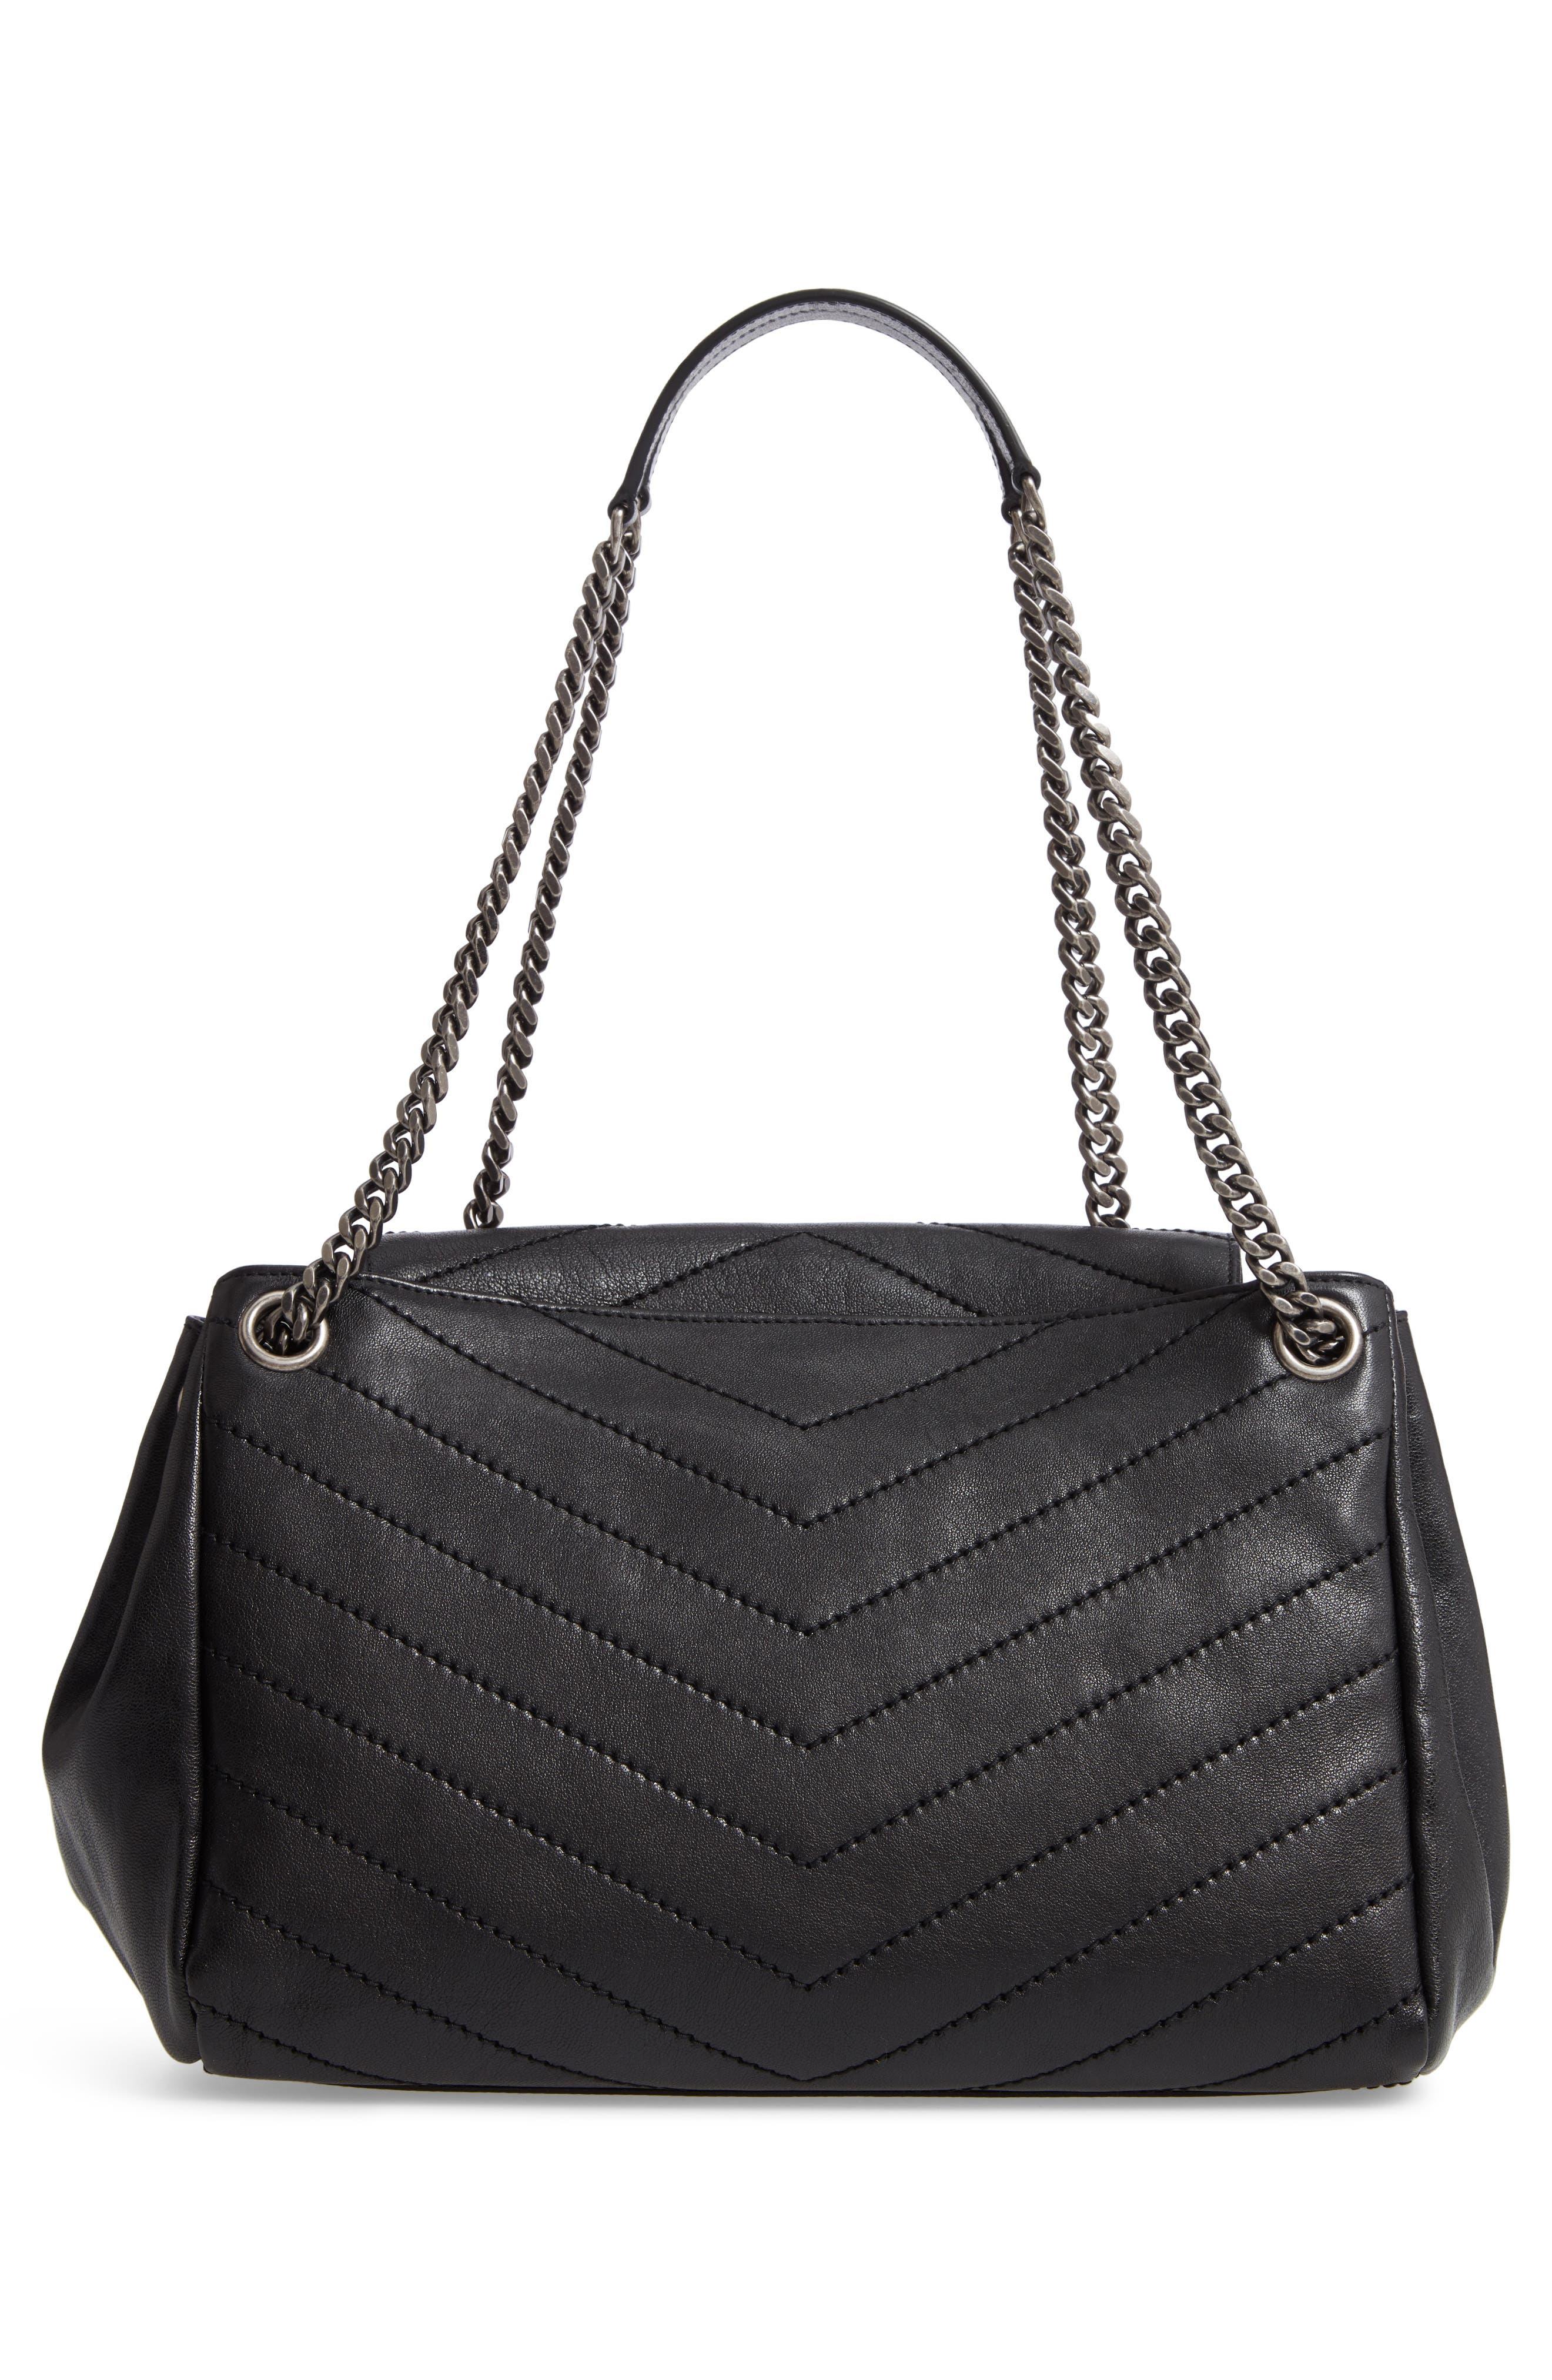 Nolita Large Leather Shoulder Bag,                             Alternate thumbnail 3, color,                             NOIR